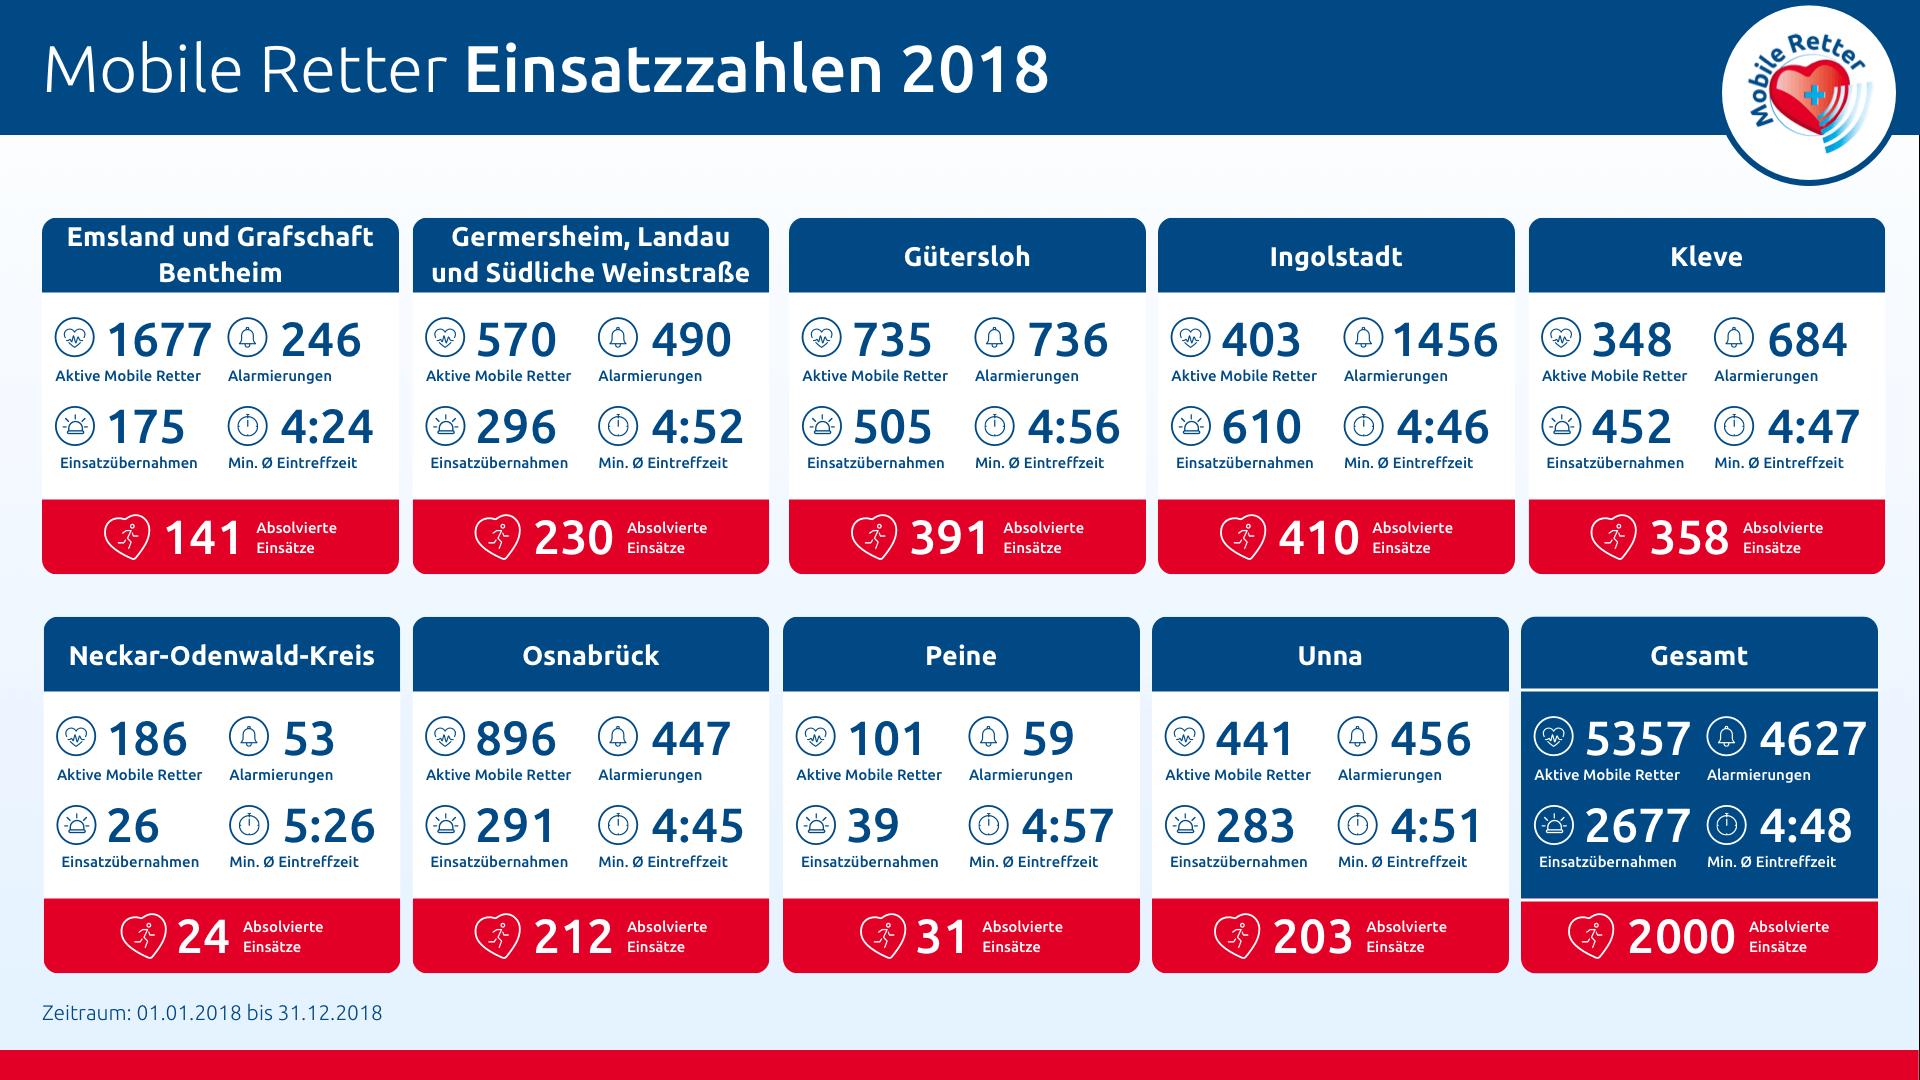 Mobile Retter Einsatzstatistik 2018